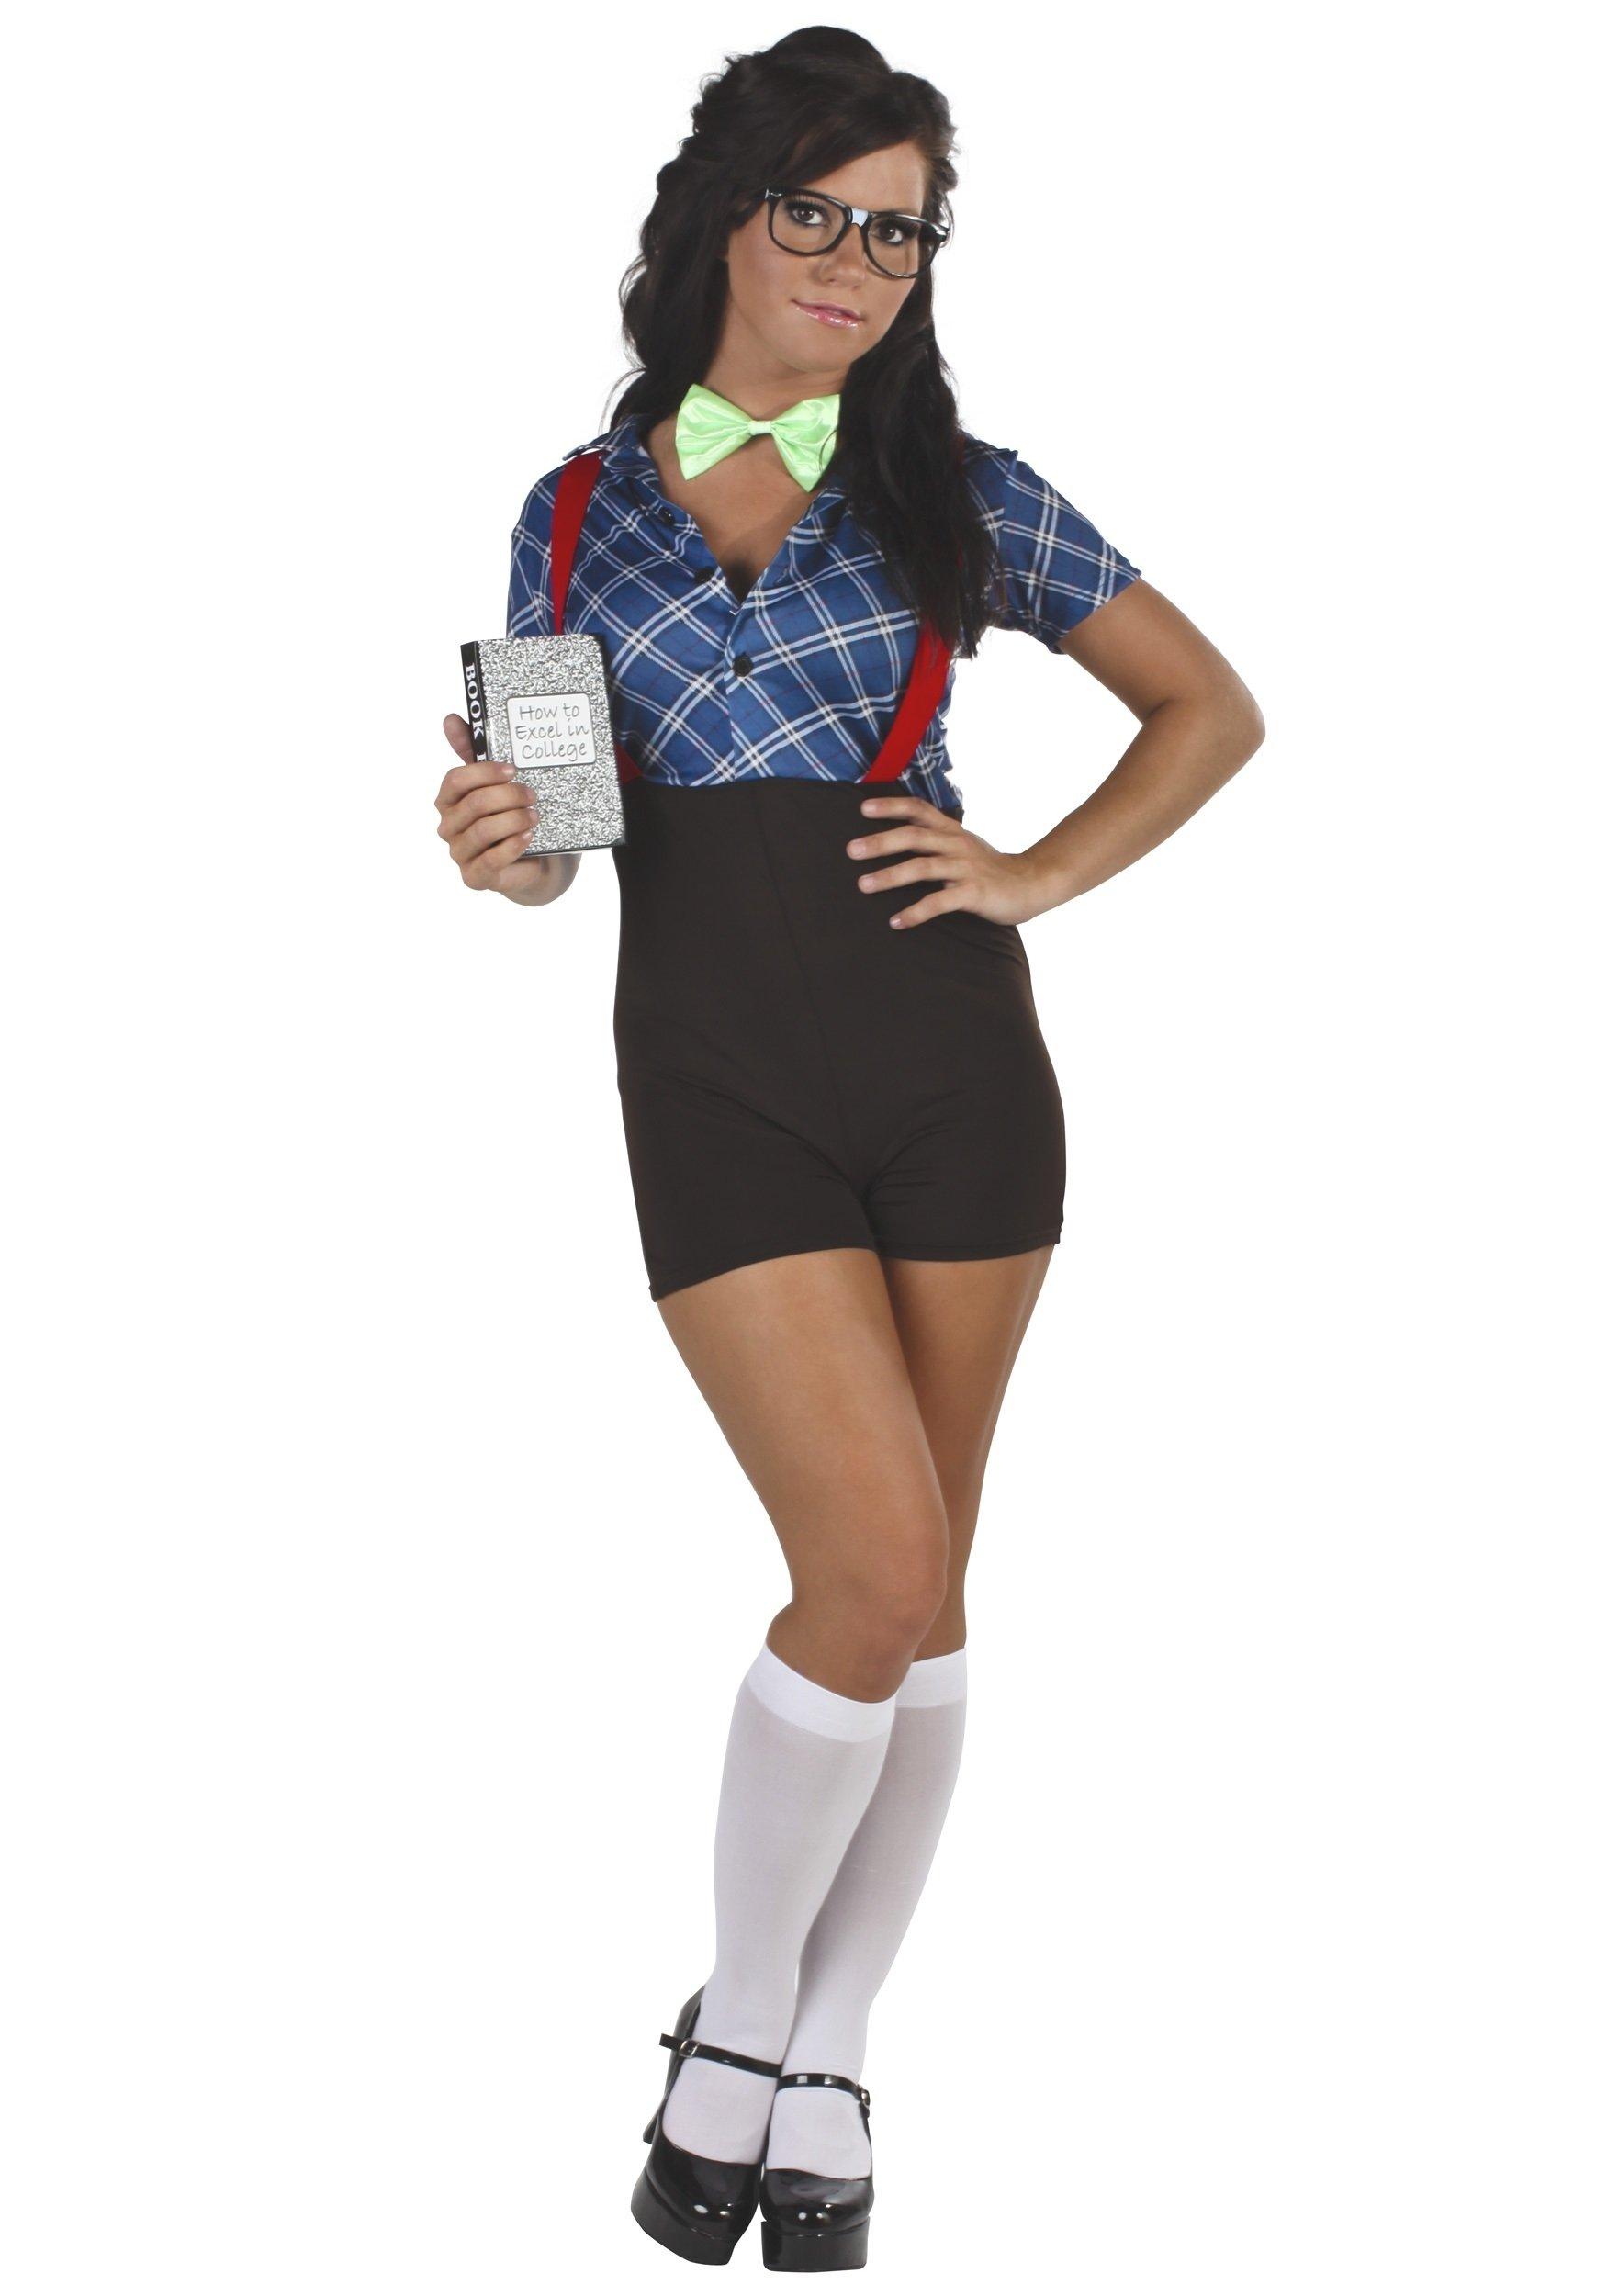 10 Wonderful Cool Halloween Costume Ideas For Girls sexy girl nerd costume halloween costumes 2020